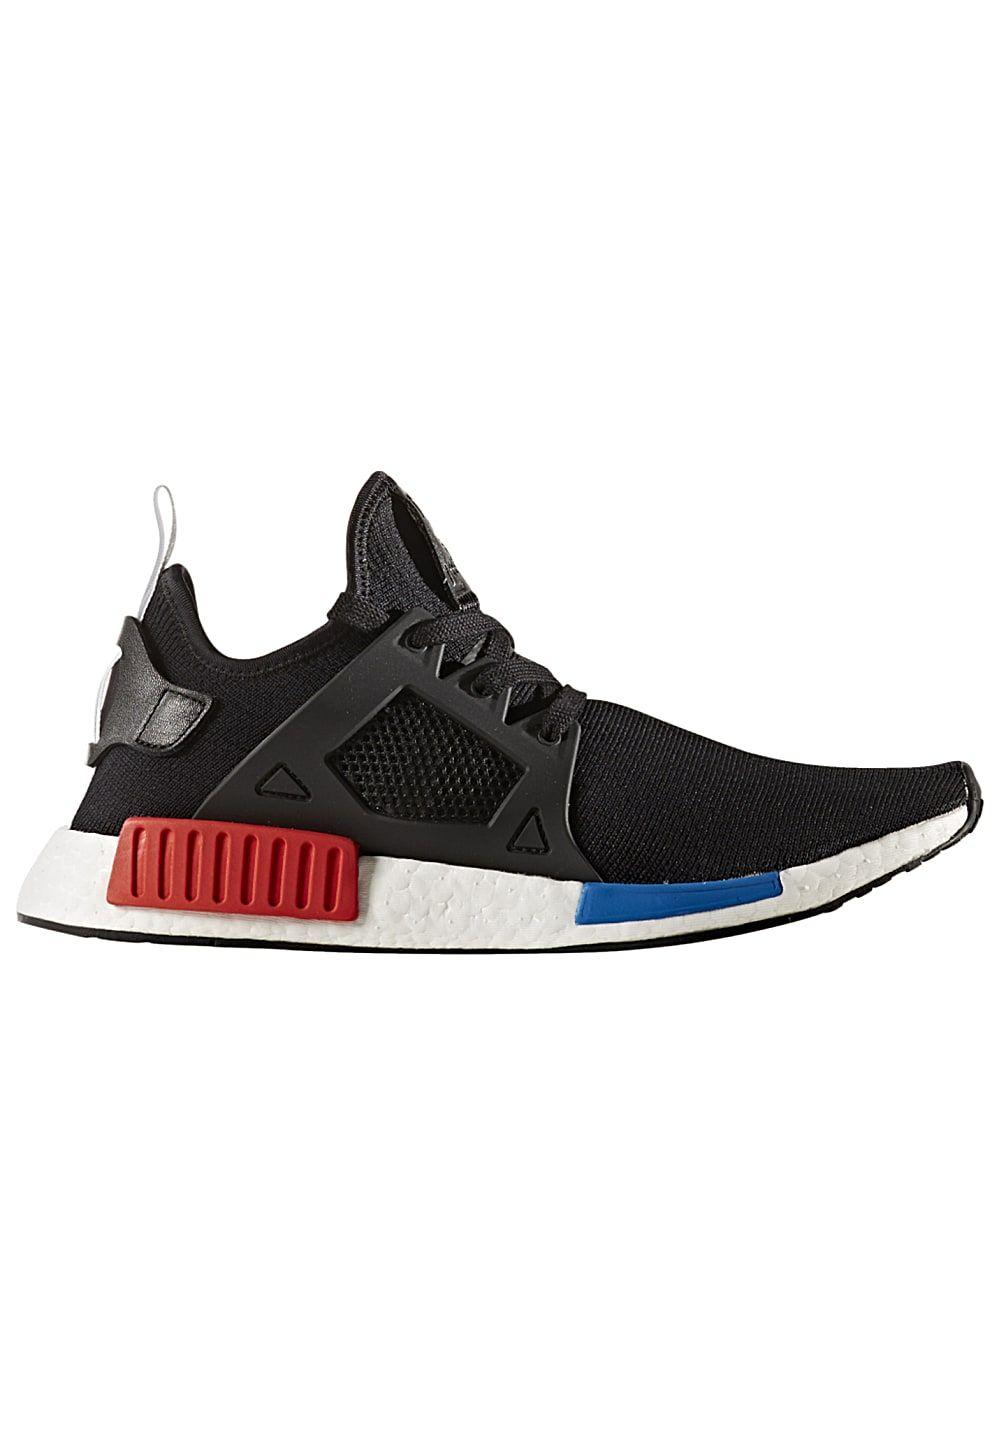 Sneaker Für Adidas xr1 Nmd Primeknit Herren SchwarzSchuhe MqSzUVp